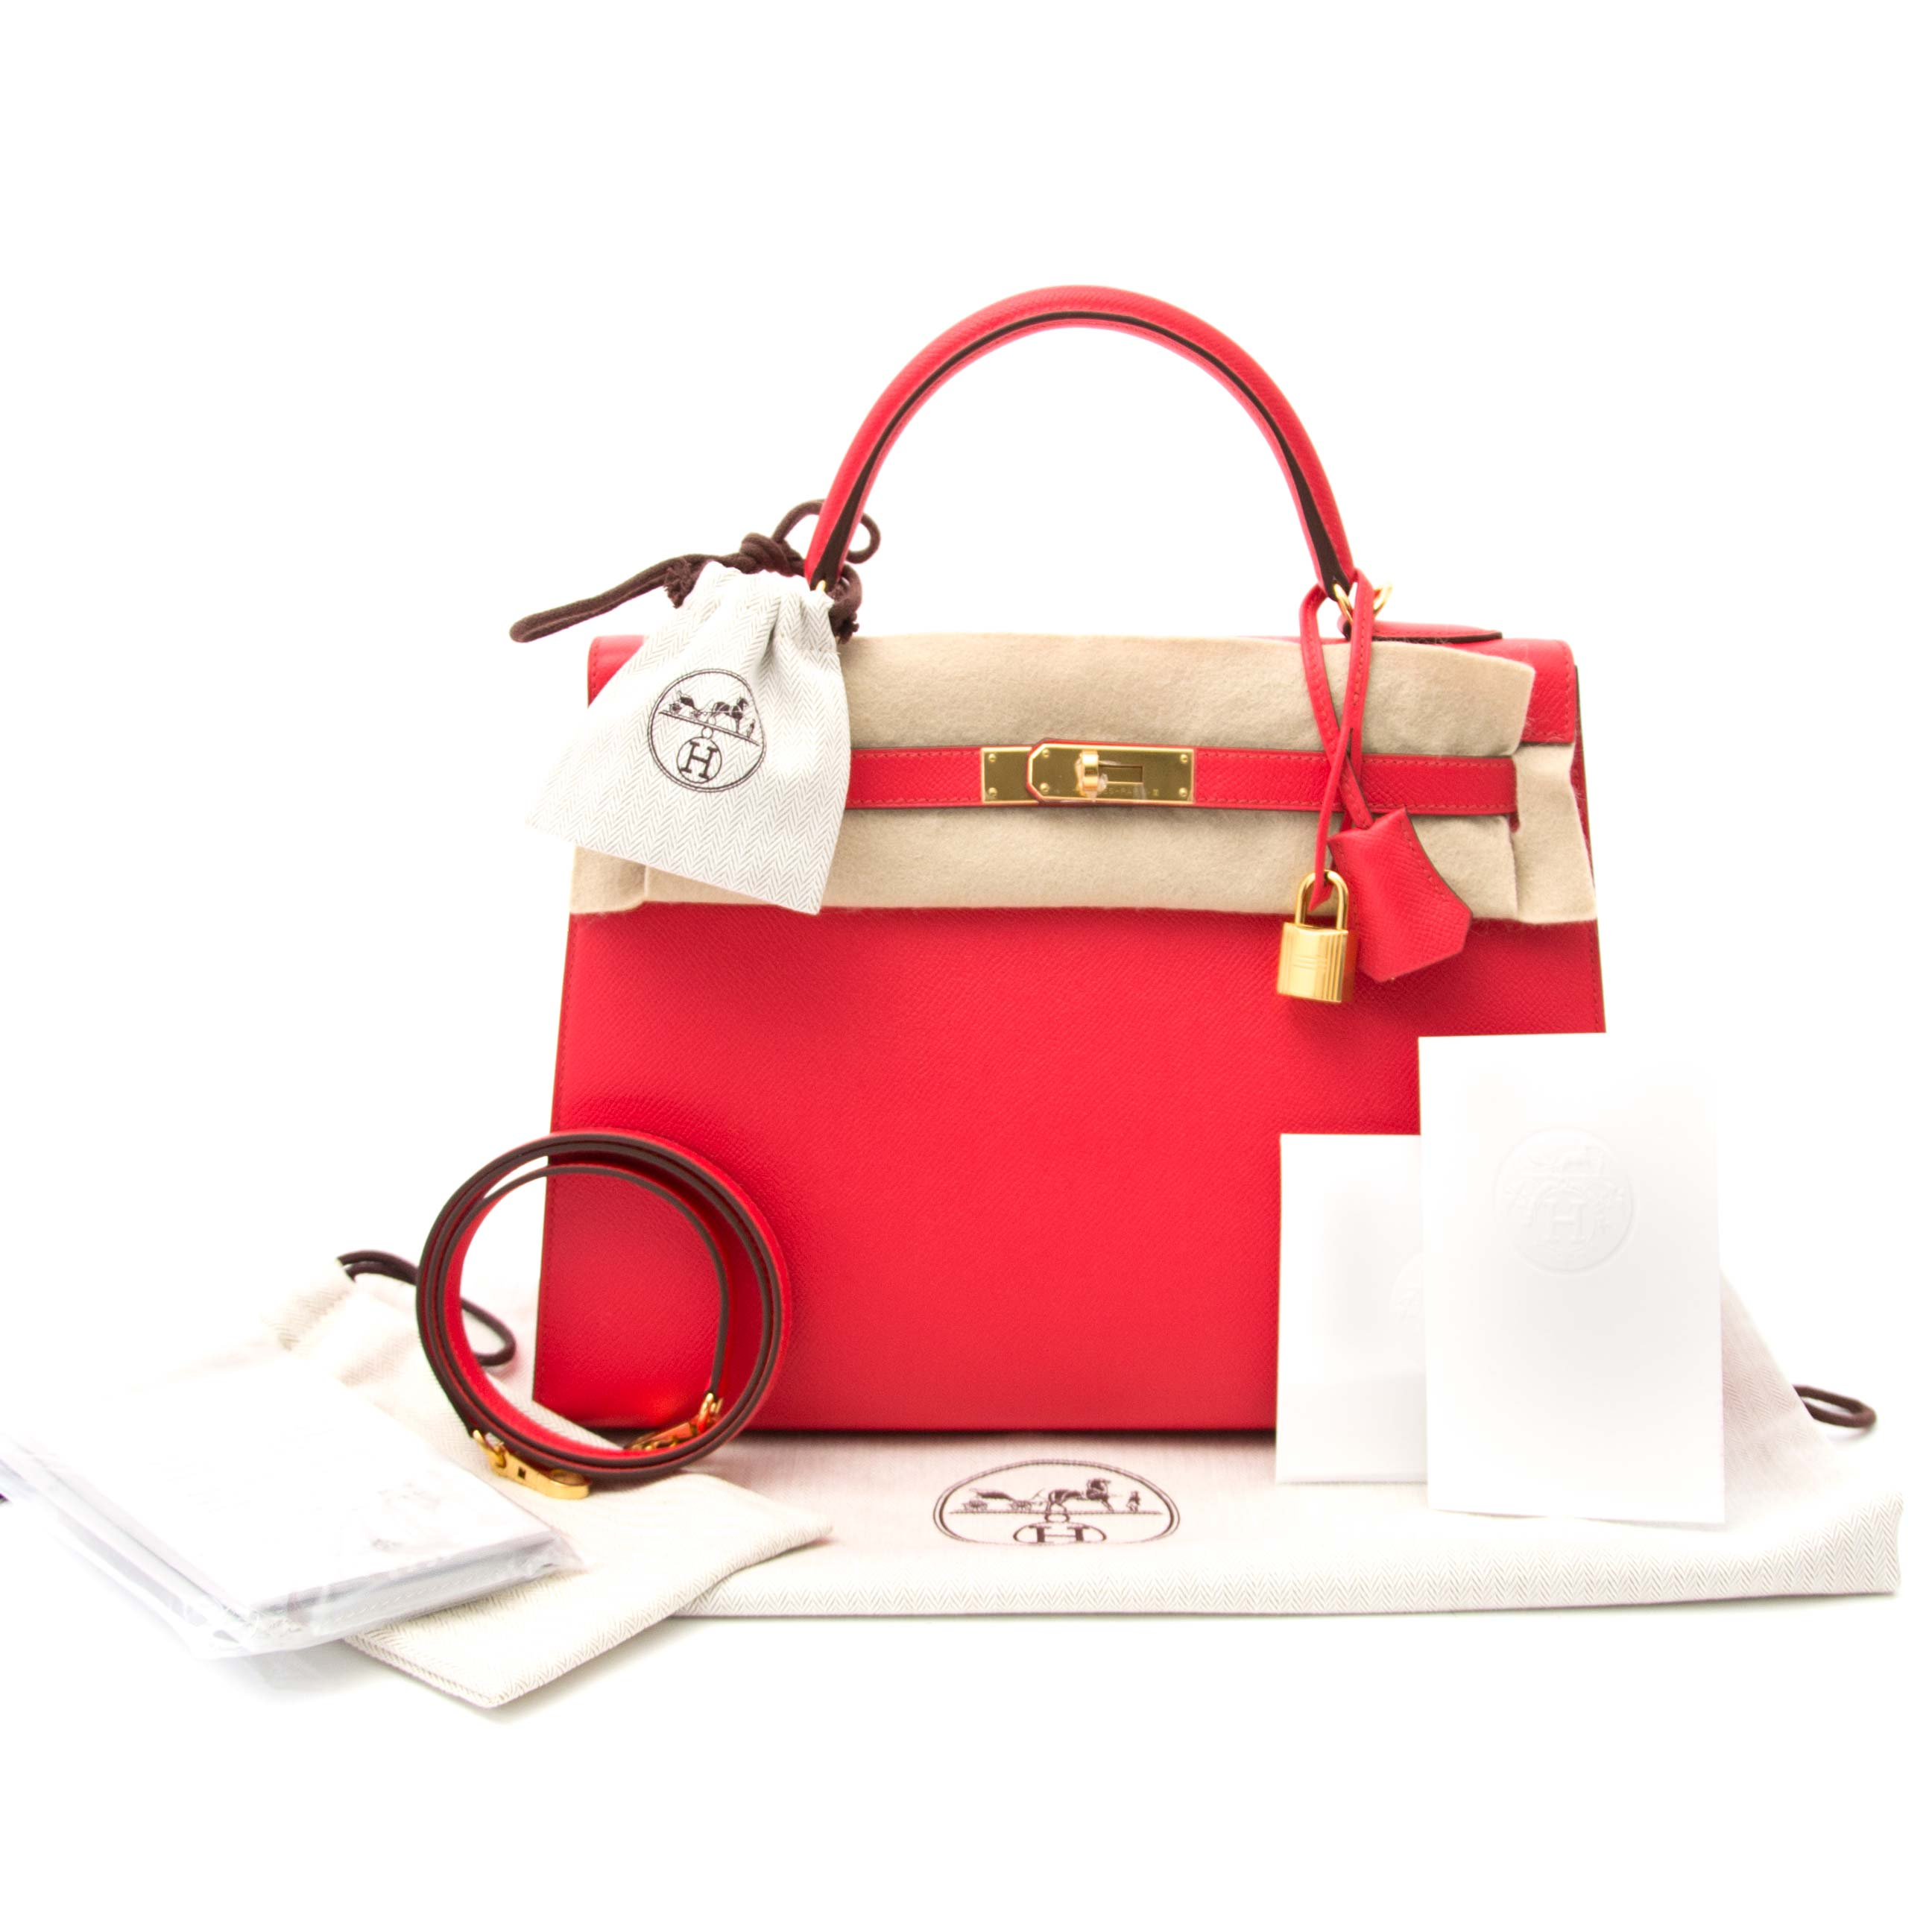 NEVER USED Hermès Kelly Sellier 32 Epsom Rouge Tomate GHW at 1stdibs c8589db96832c